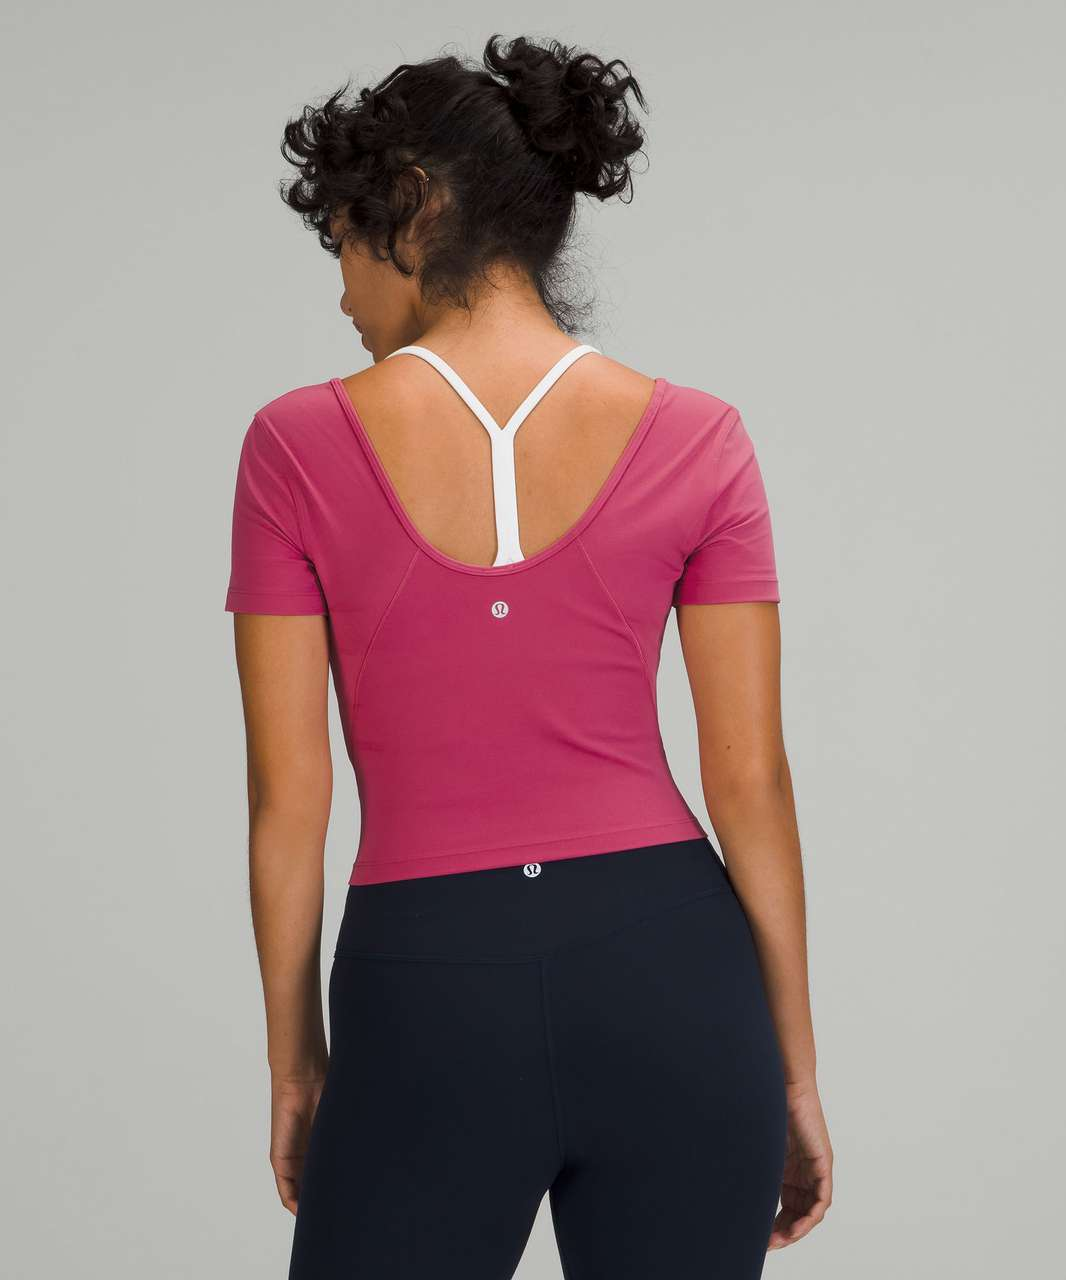 Lululemon Align T-Shirt - Pink Lychee